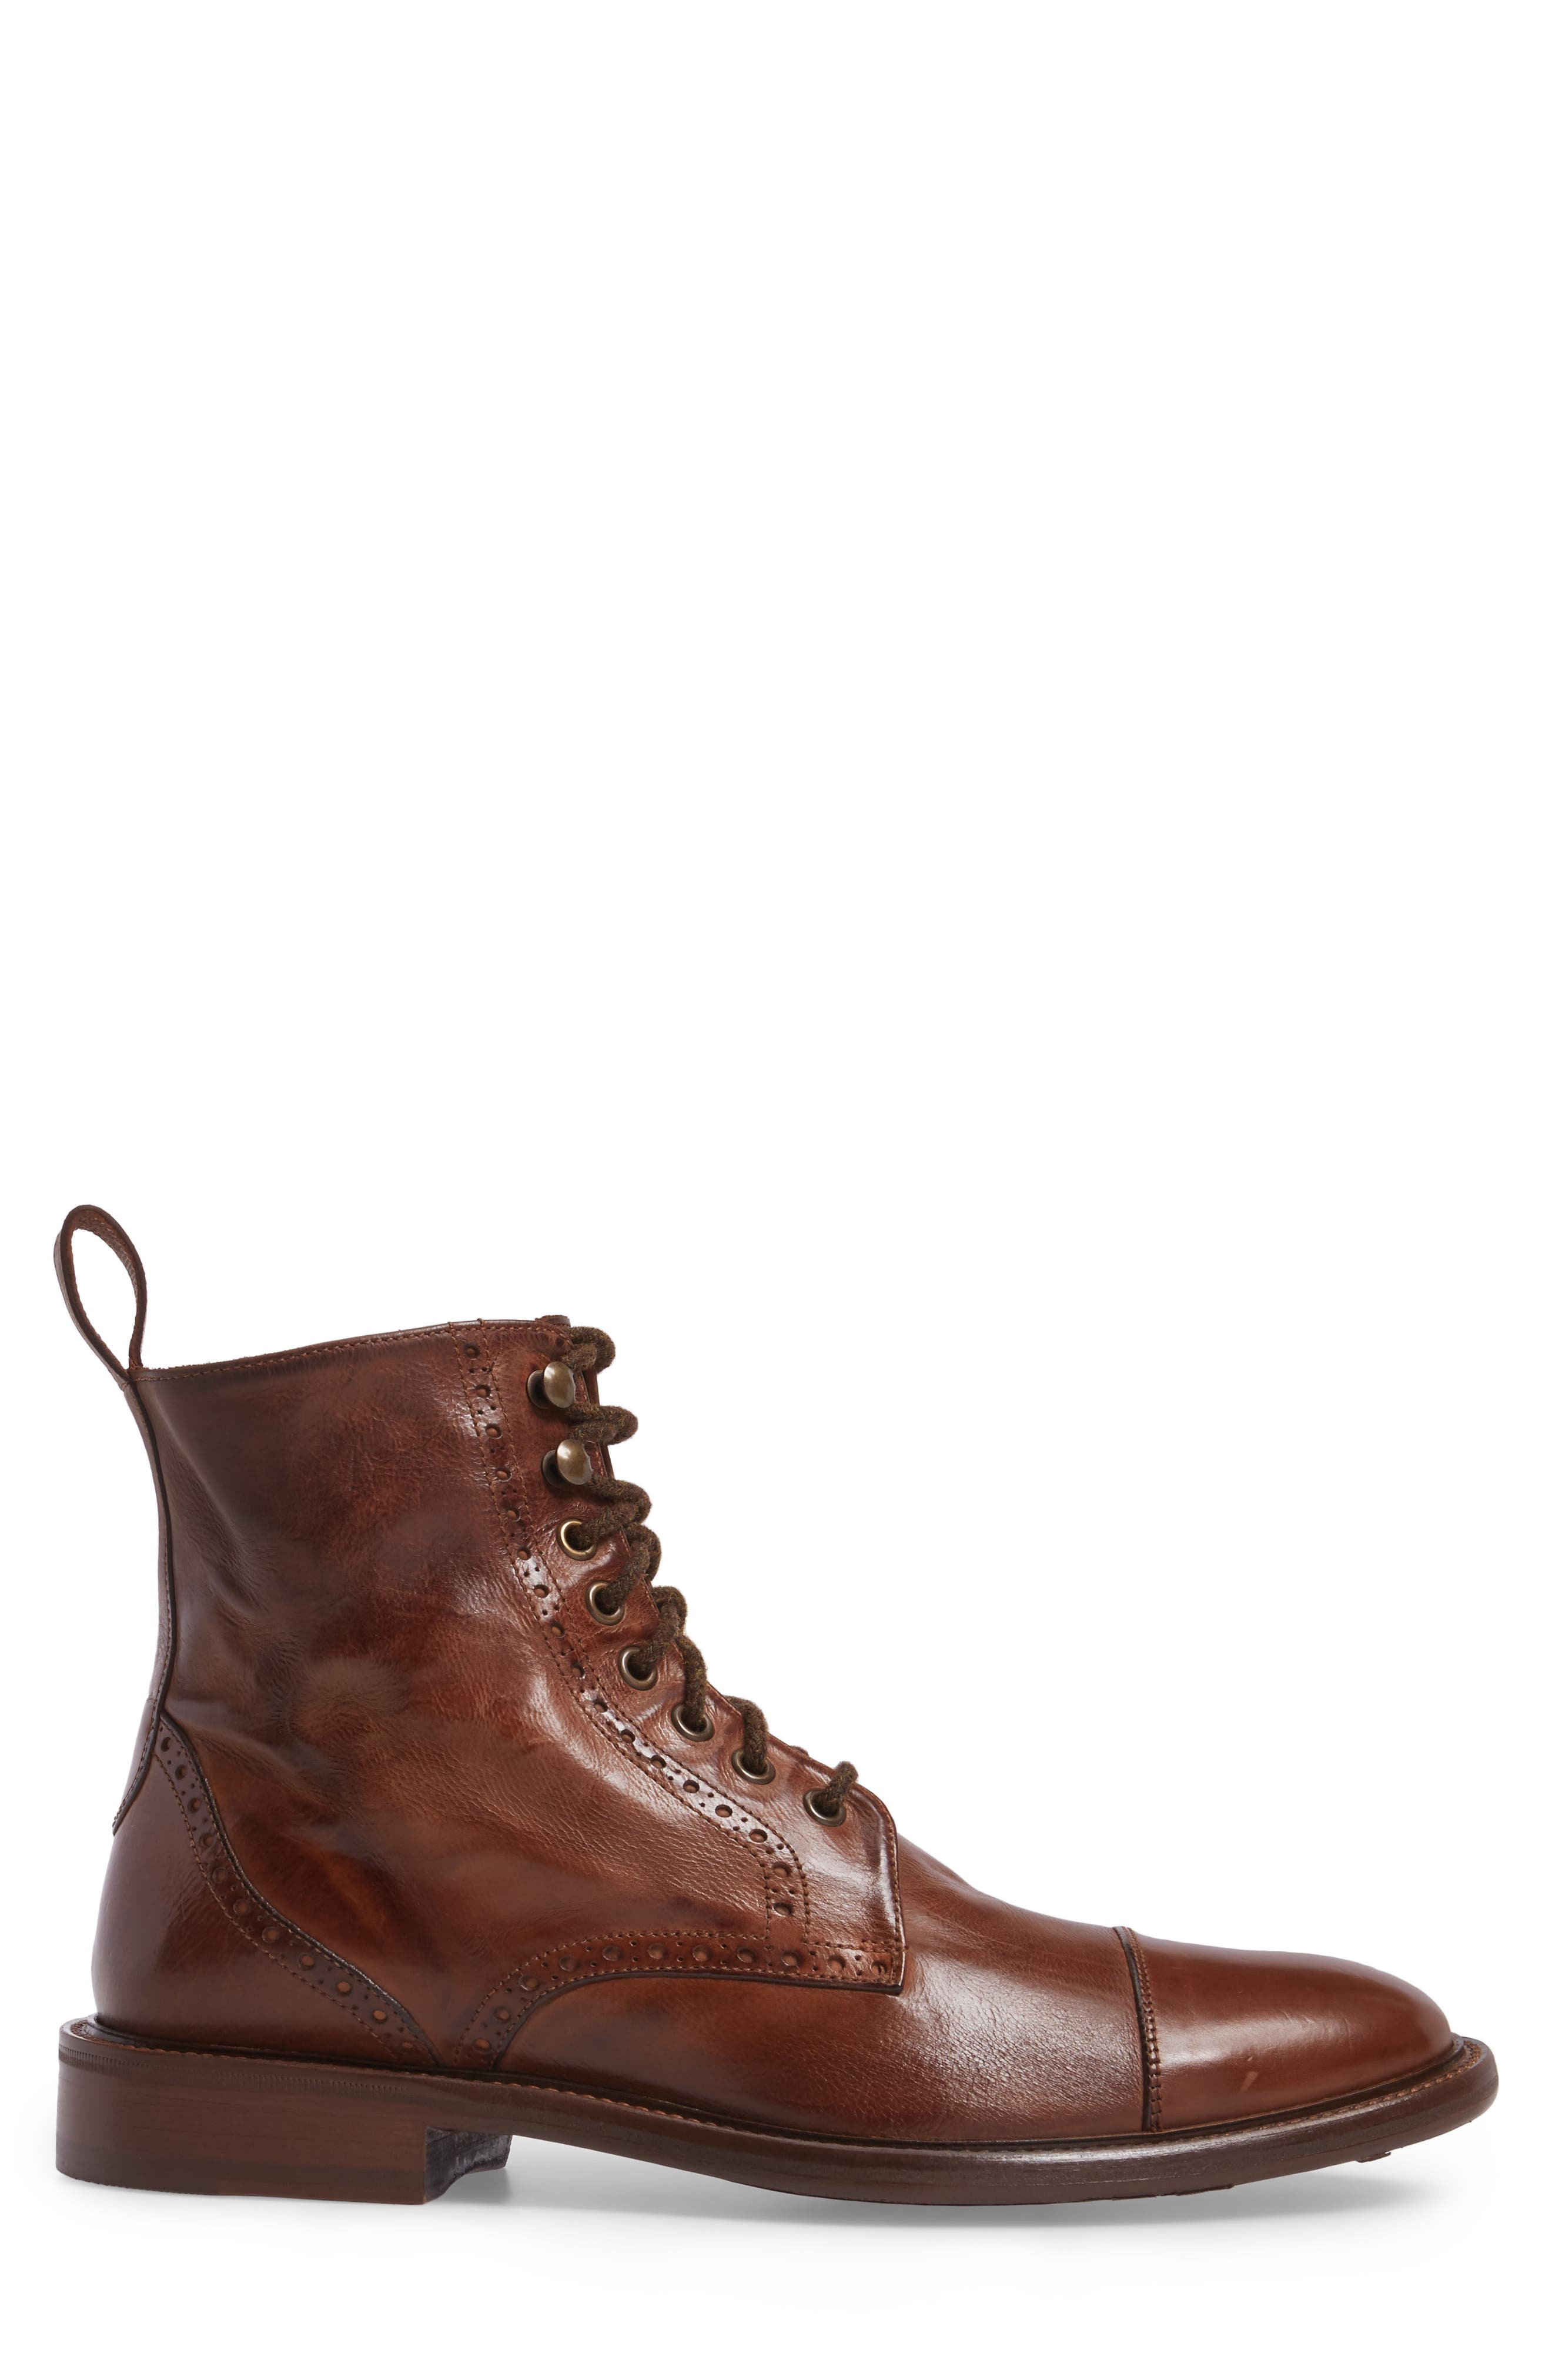 Bryson Cap Toe Boot,                             Alternate thumbnail 3, color,                             Mahogany Leather